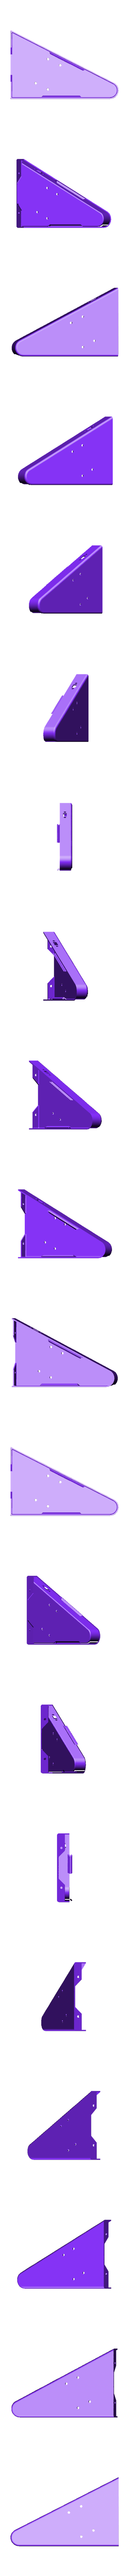 body-right-bottom.stl Download free STL file MX MIDI Guitar • 3D print model, Adafruit